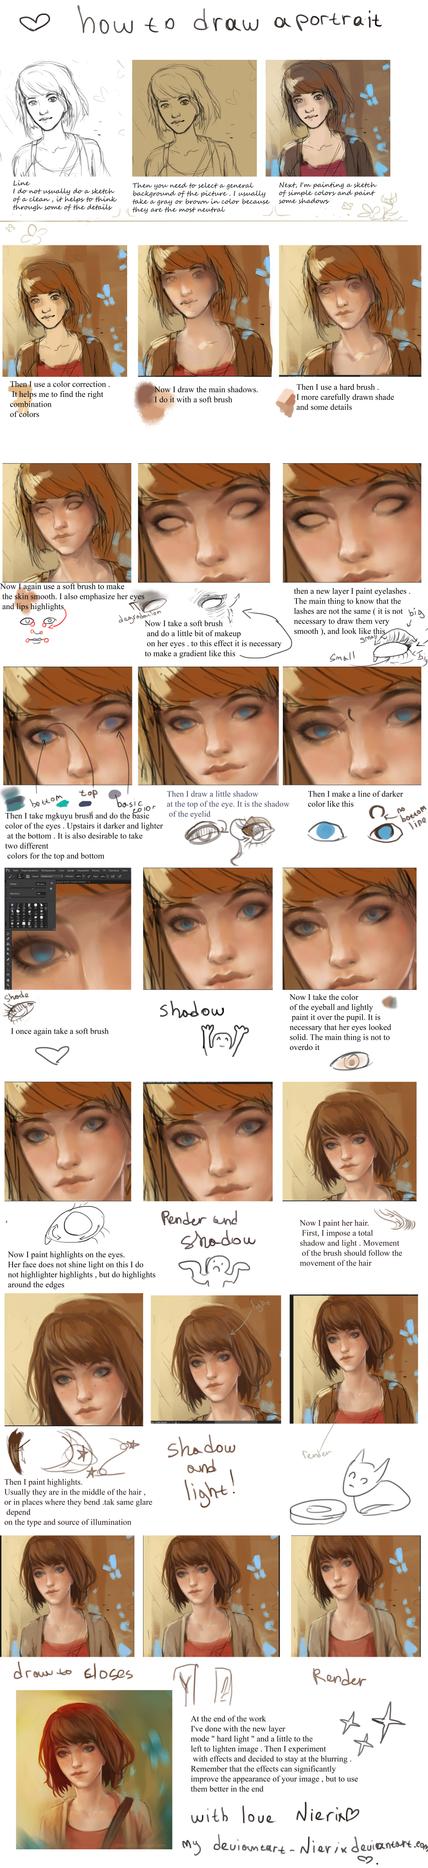 Digital painting on photoshop tutorials deviantart for Watercolor portrait tutorial